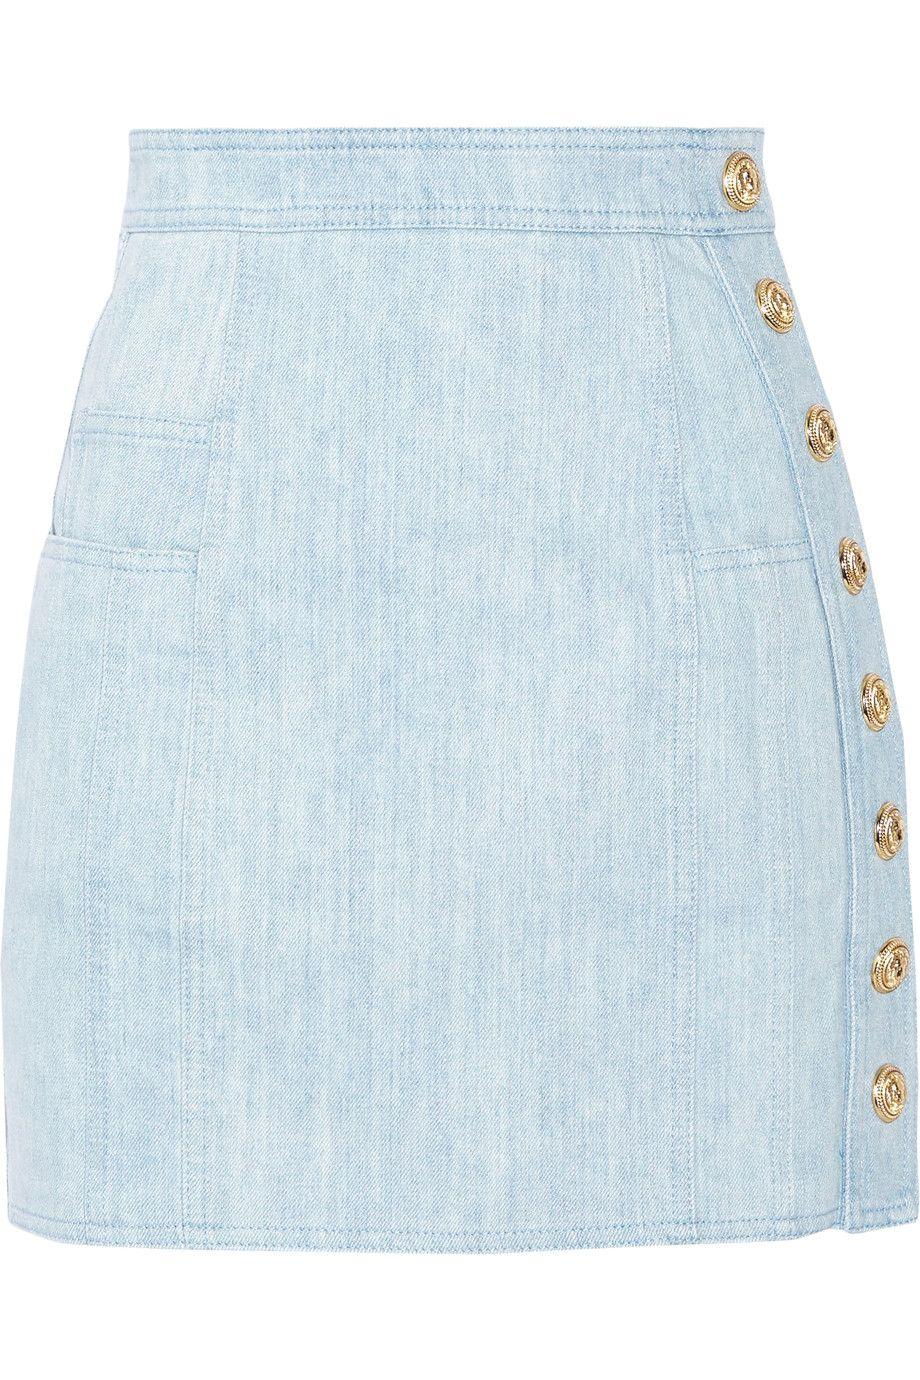 795e9ed682 Balmain - Button-detailed denim mini skirt | Sewing Inspiration ...